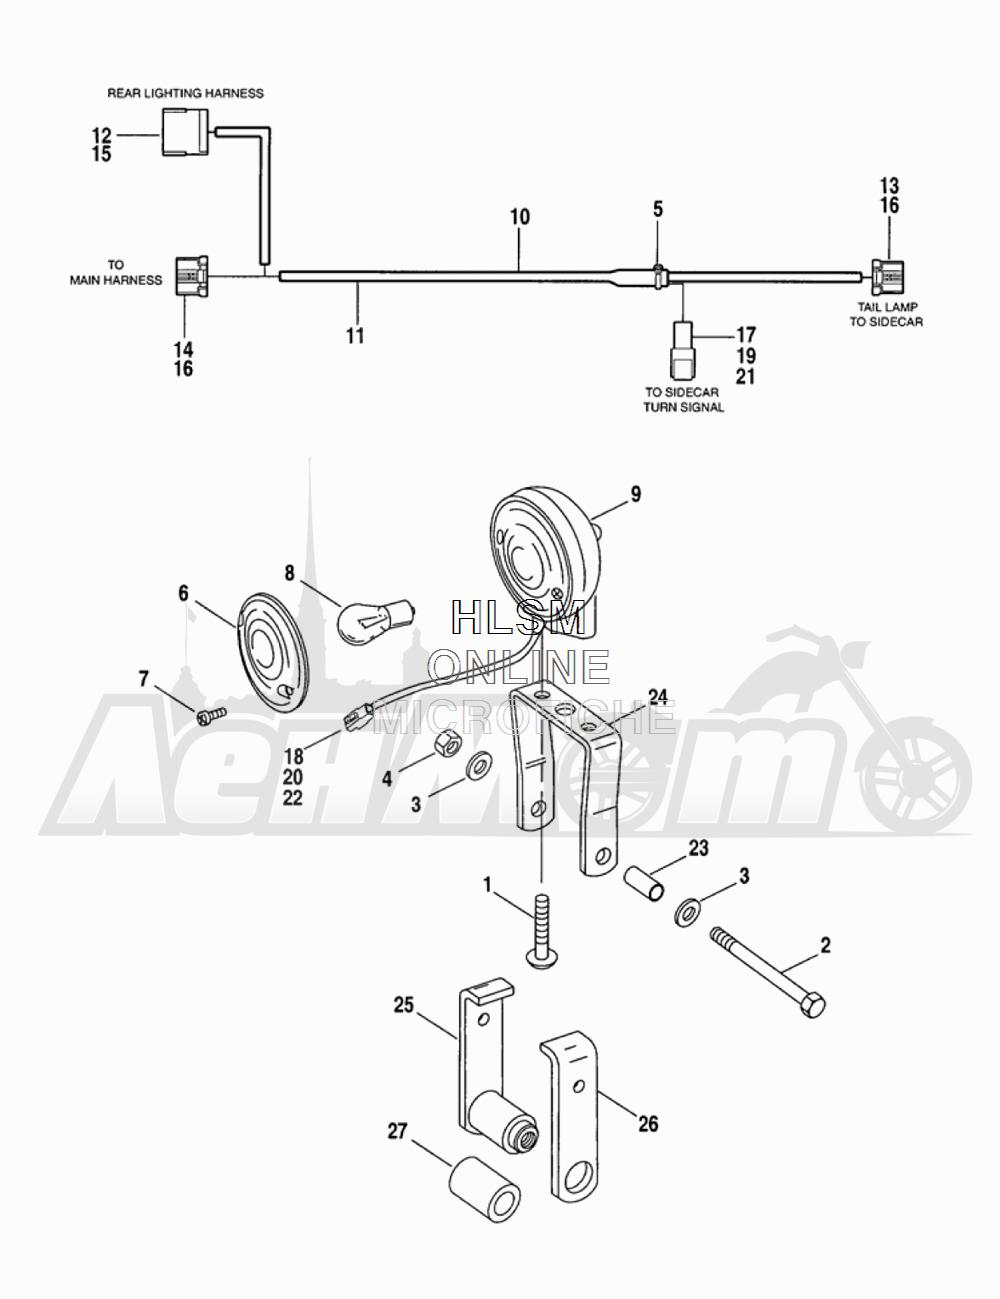 Запчасти для Мотоцикла Harley-Davidson 2005 TLE - SIDE CAR Раздел: TURN SIGNAL ASSEMPLY | сигнал поворота ASSEMPLY